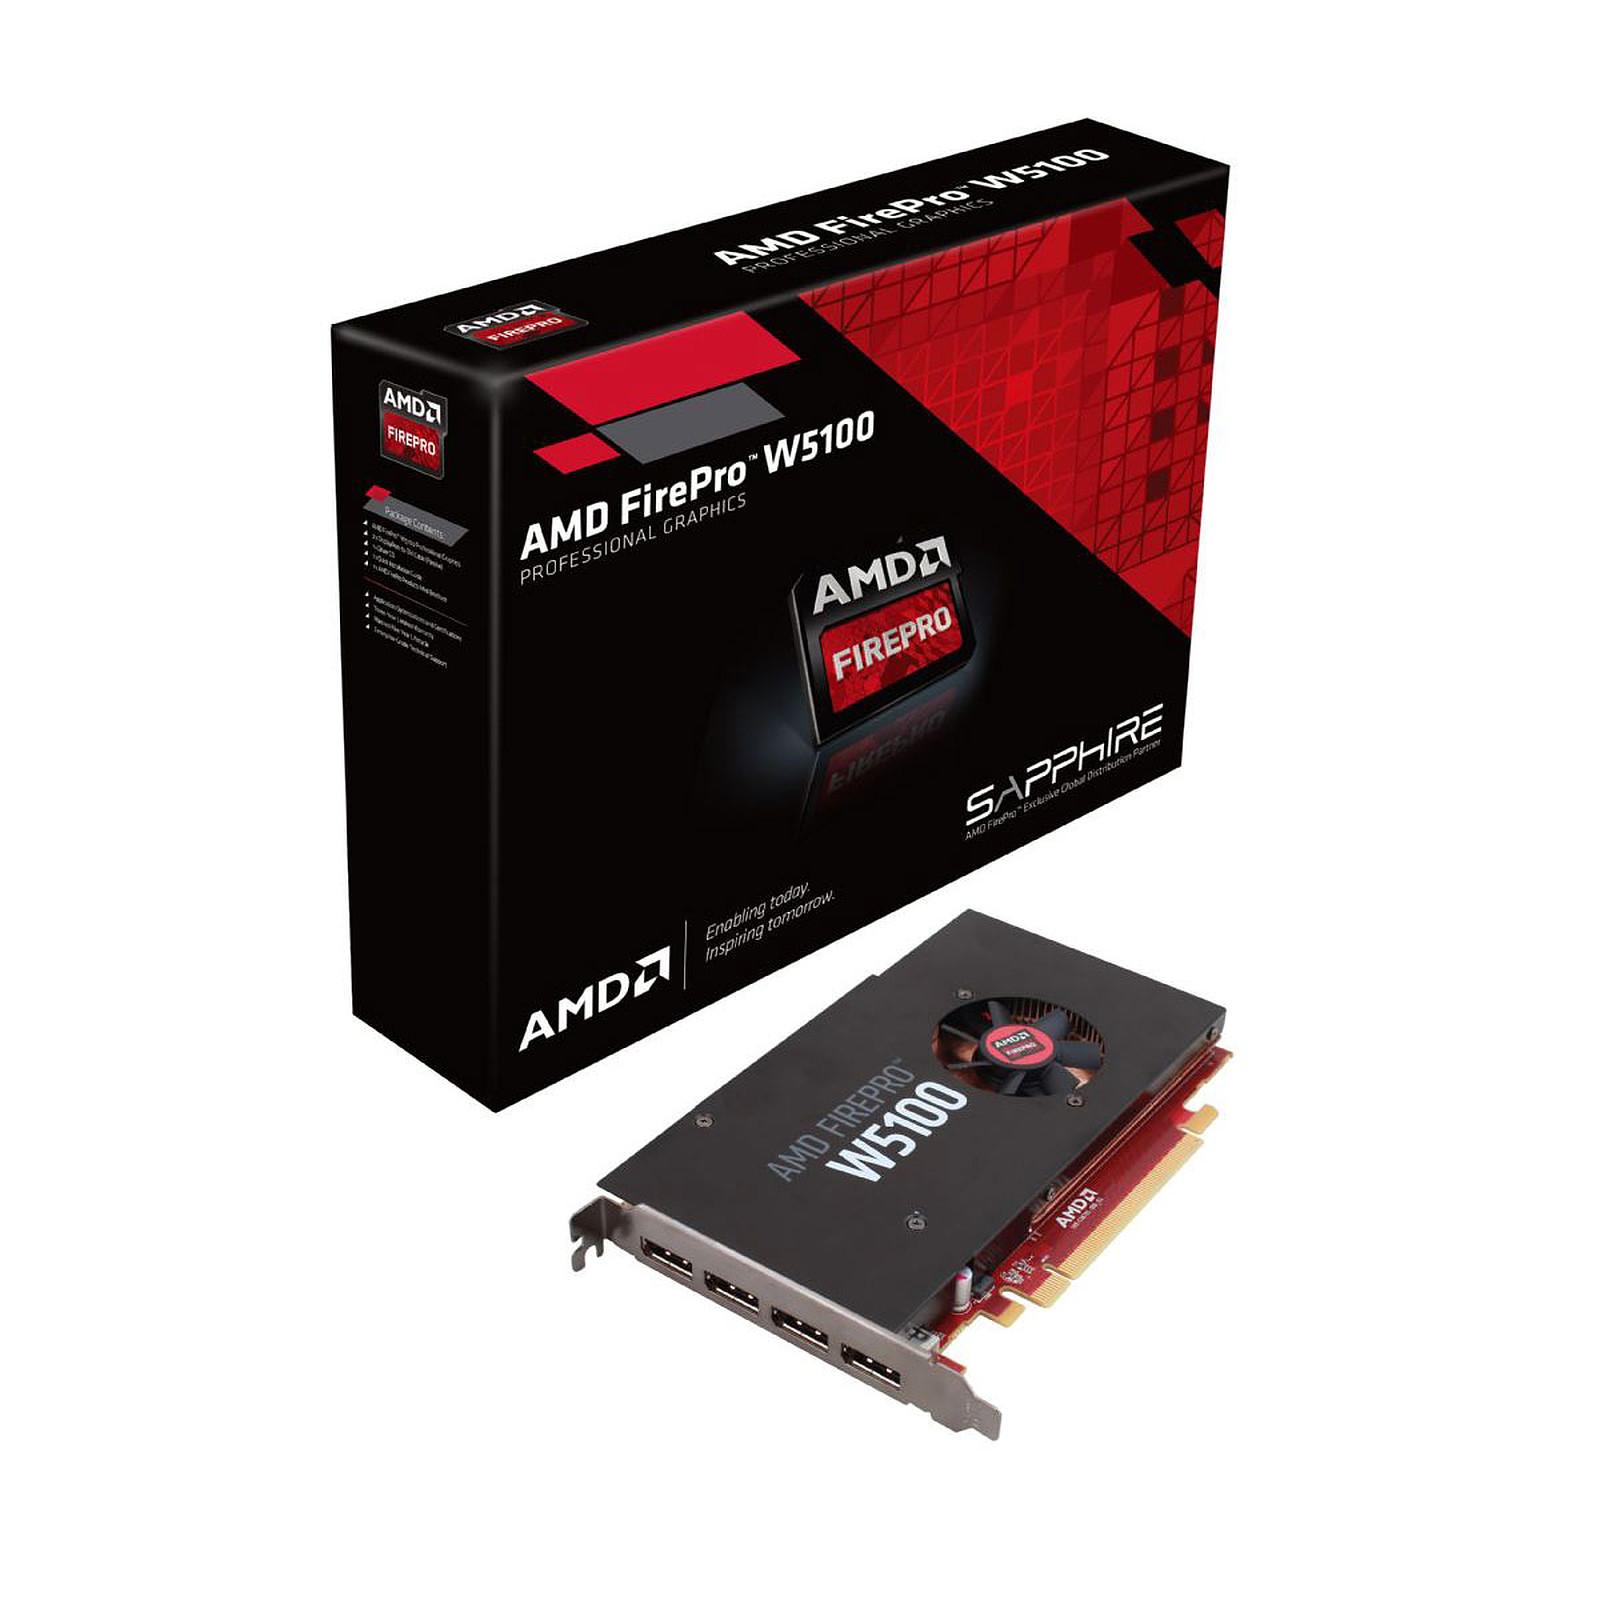 AMD FirePro 5100 4 GB 31004-52-40B